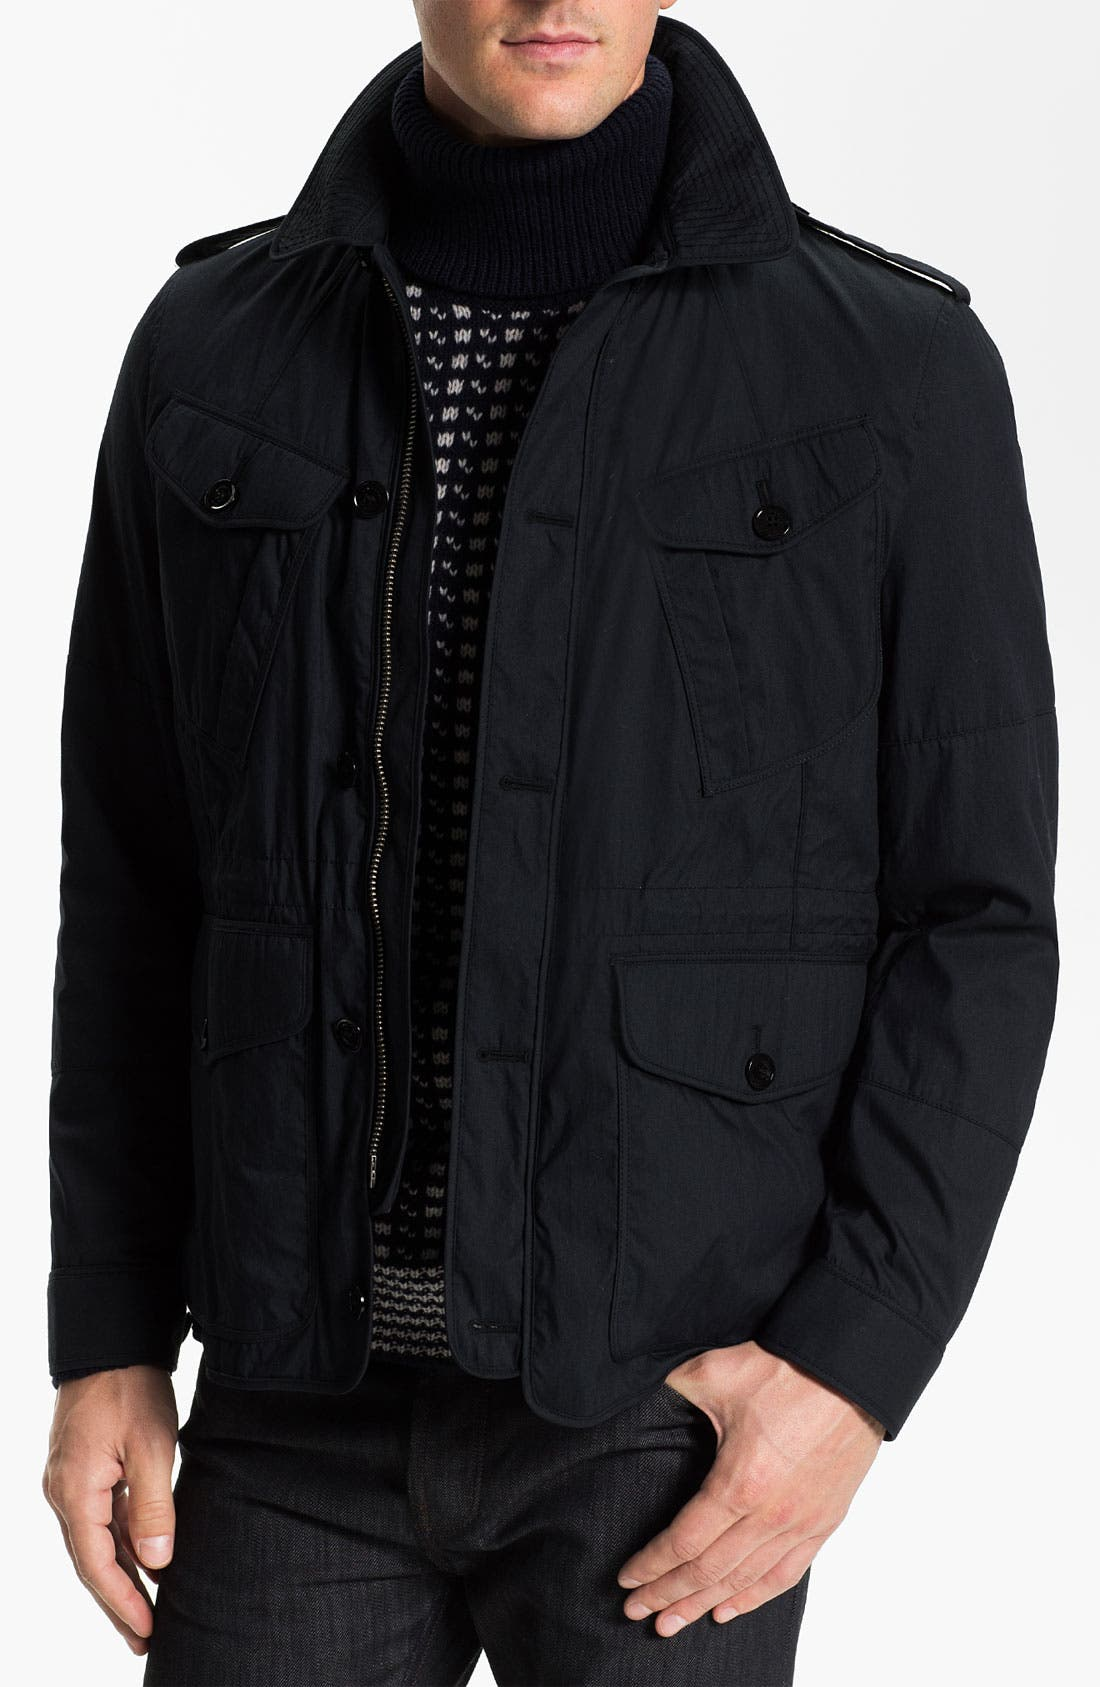 Alternate Image 1 Selected - Burberry Brit Field Jacket